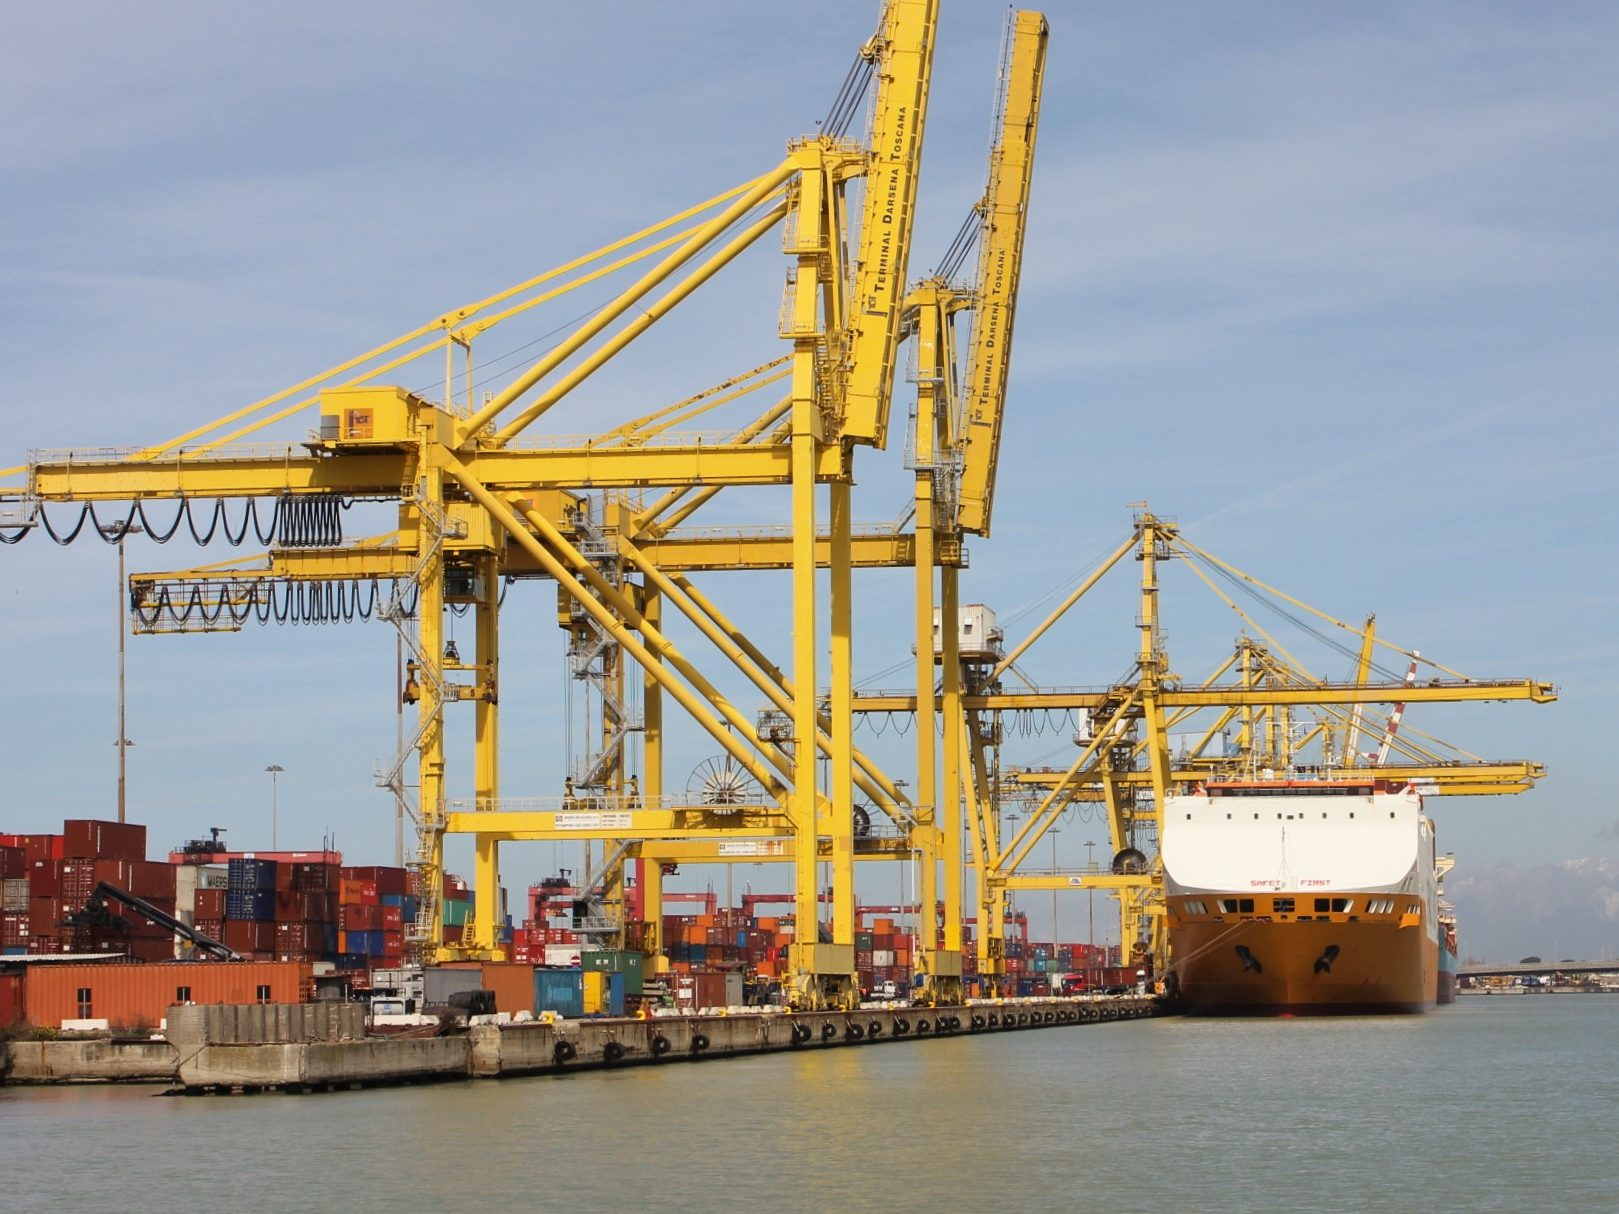 Livorno terminal container 2019